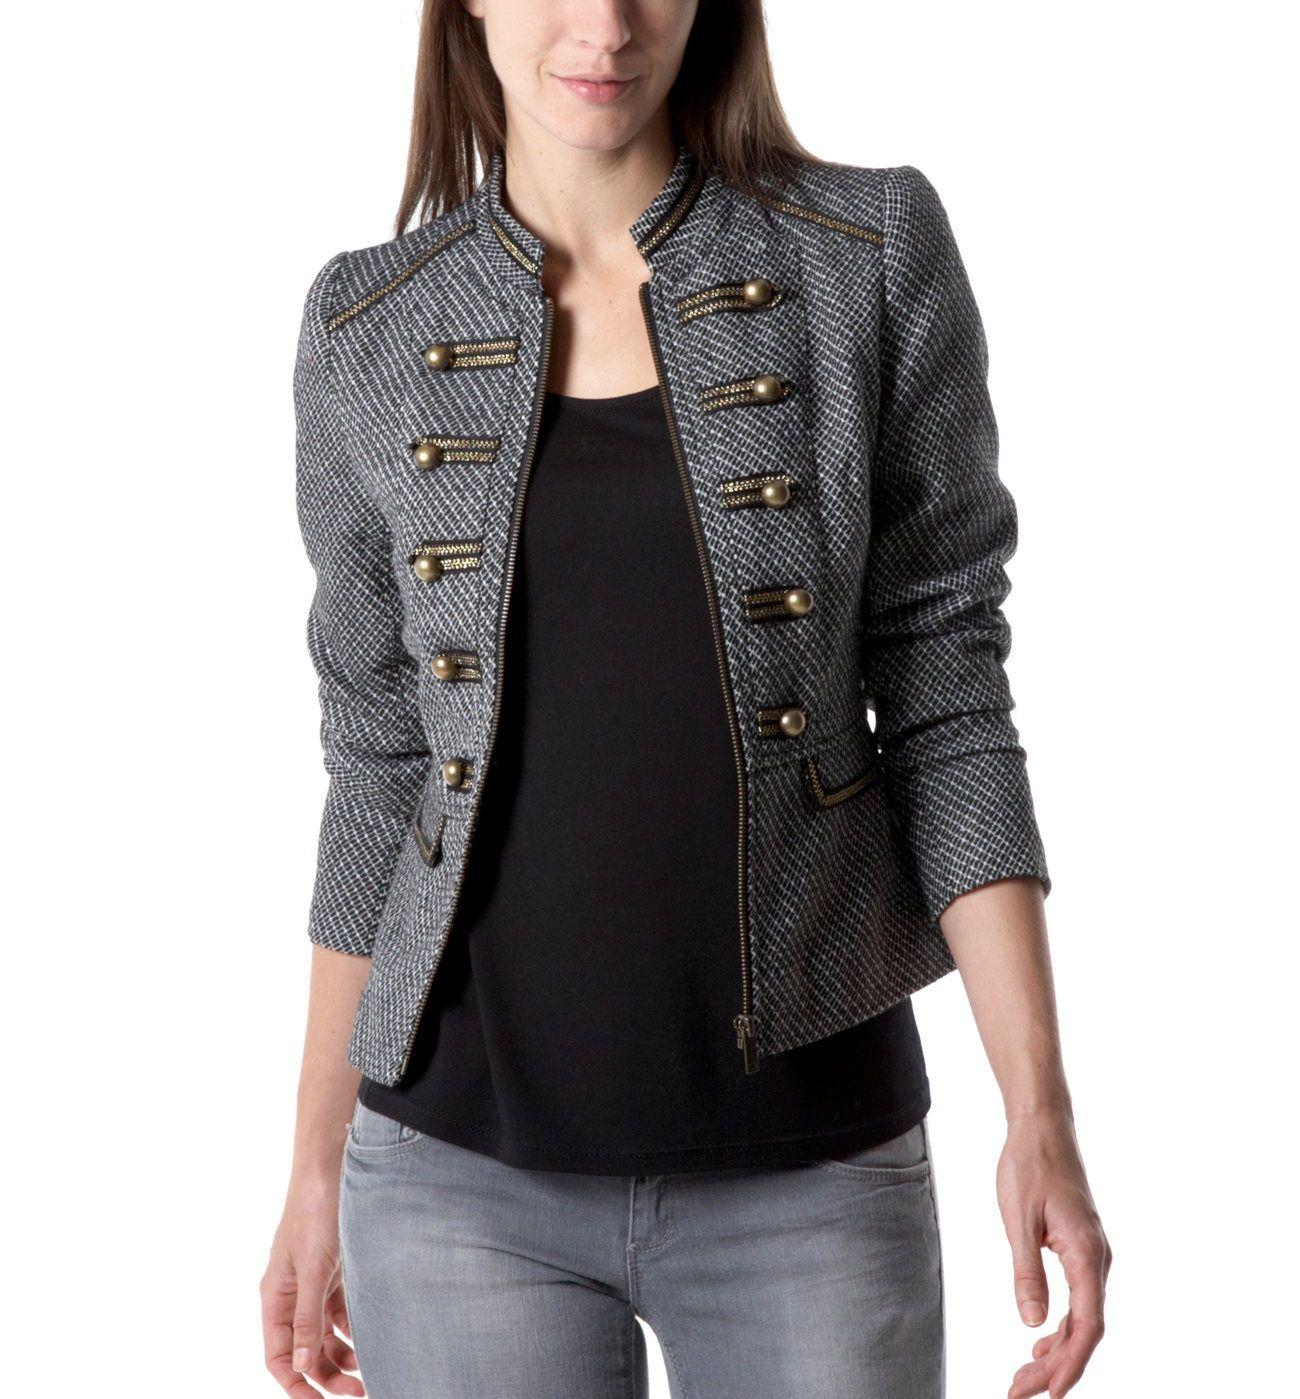 veste militaire imprim noir vestes blousons femme promod nathy pinterest. Black Bedroom Furniture Sets. Home Design Ideas